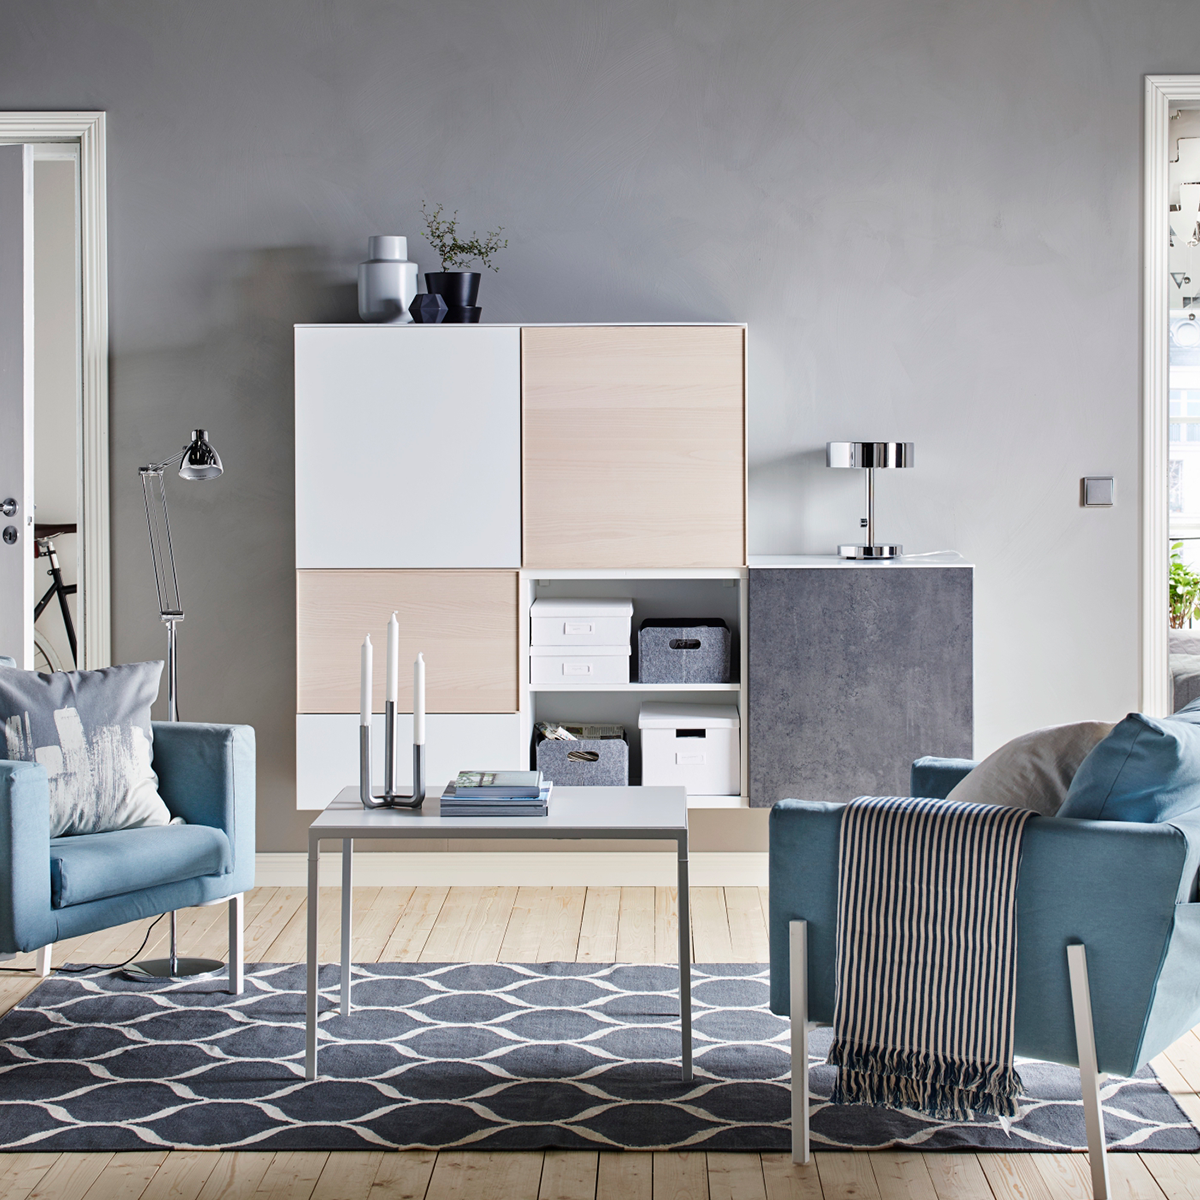 BESTÅ opbergcombinatie | IKEA IKEAnl IKEAnederland inspiratie ...